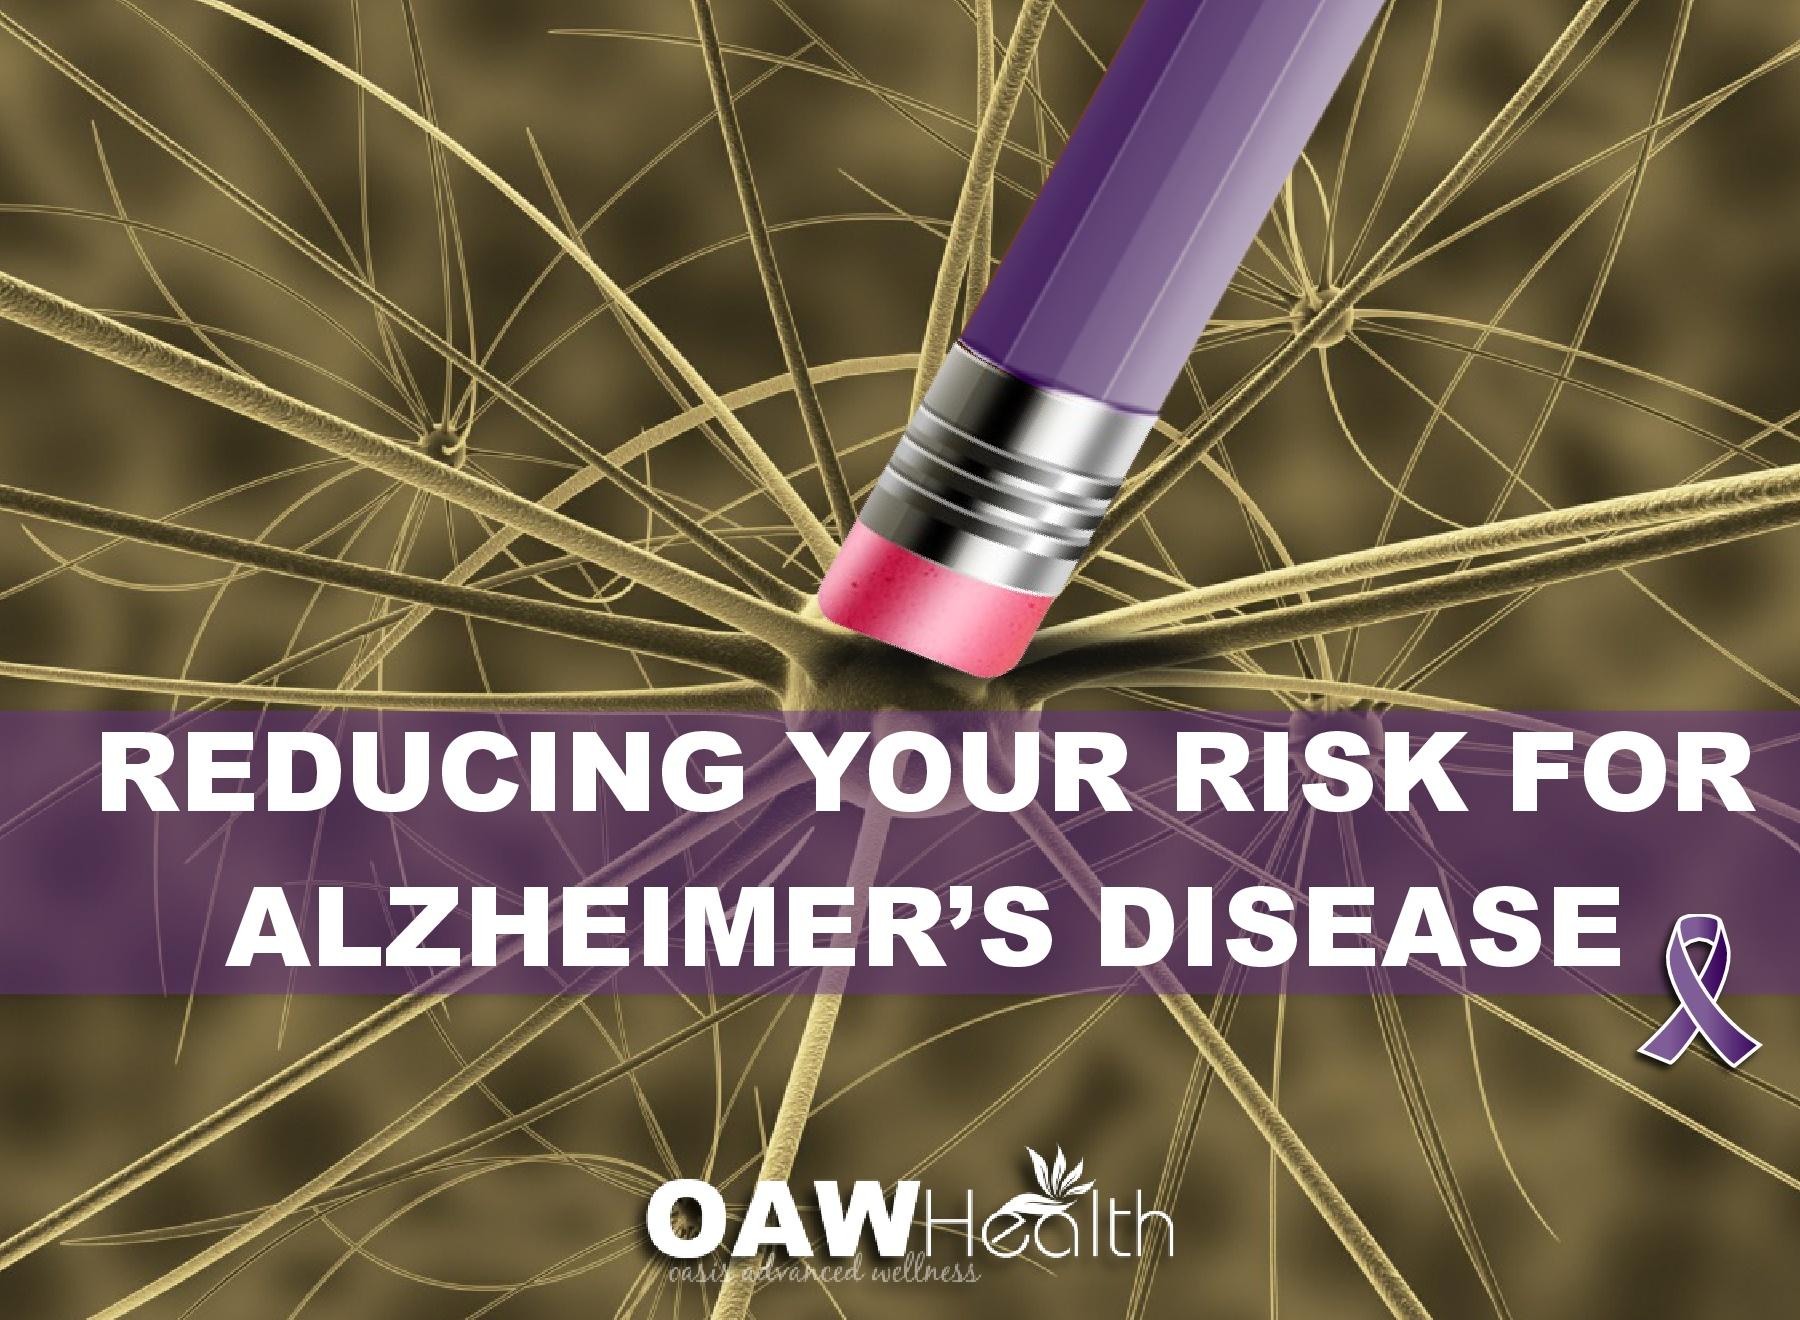 Reducing Your Risk for Alzheimer's Disease